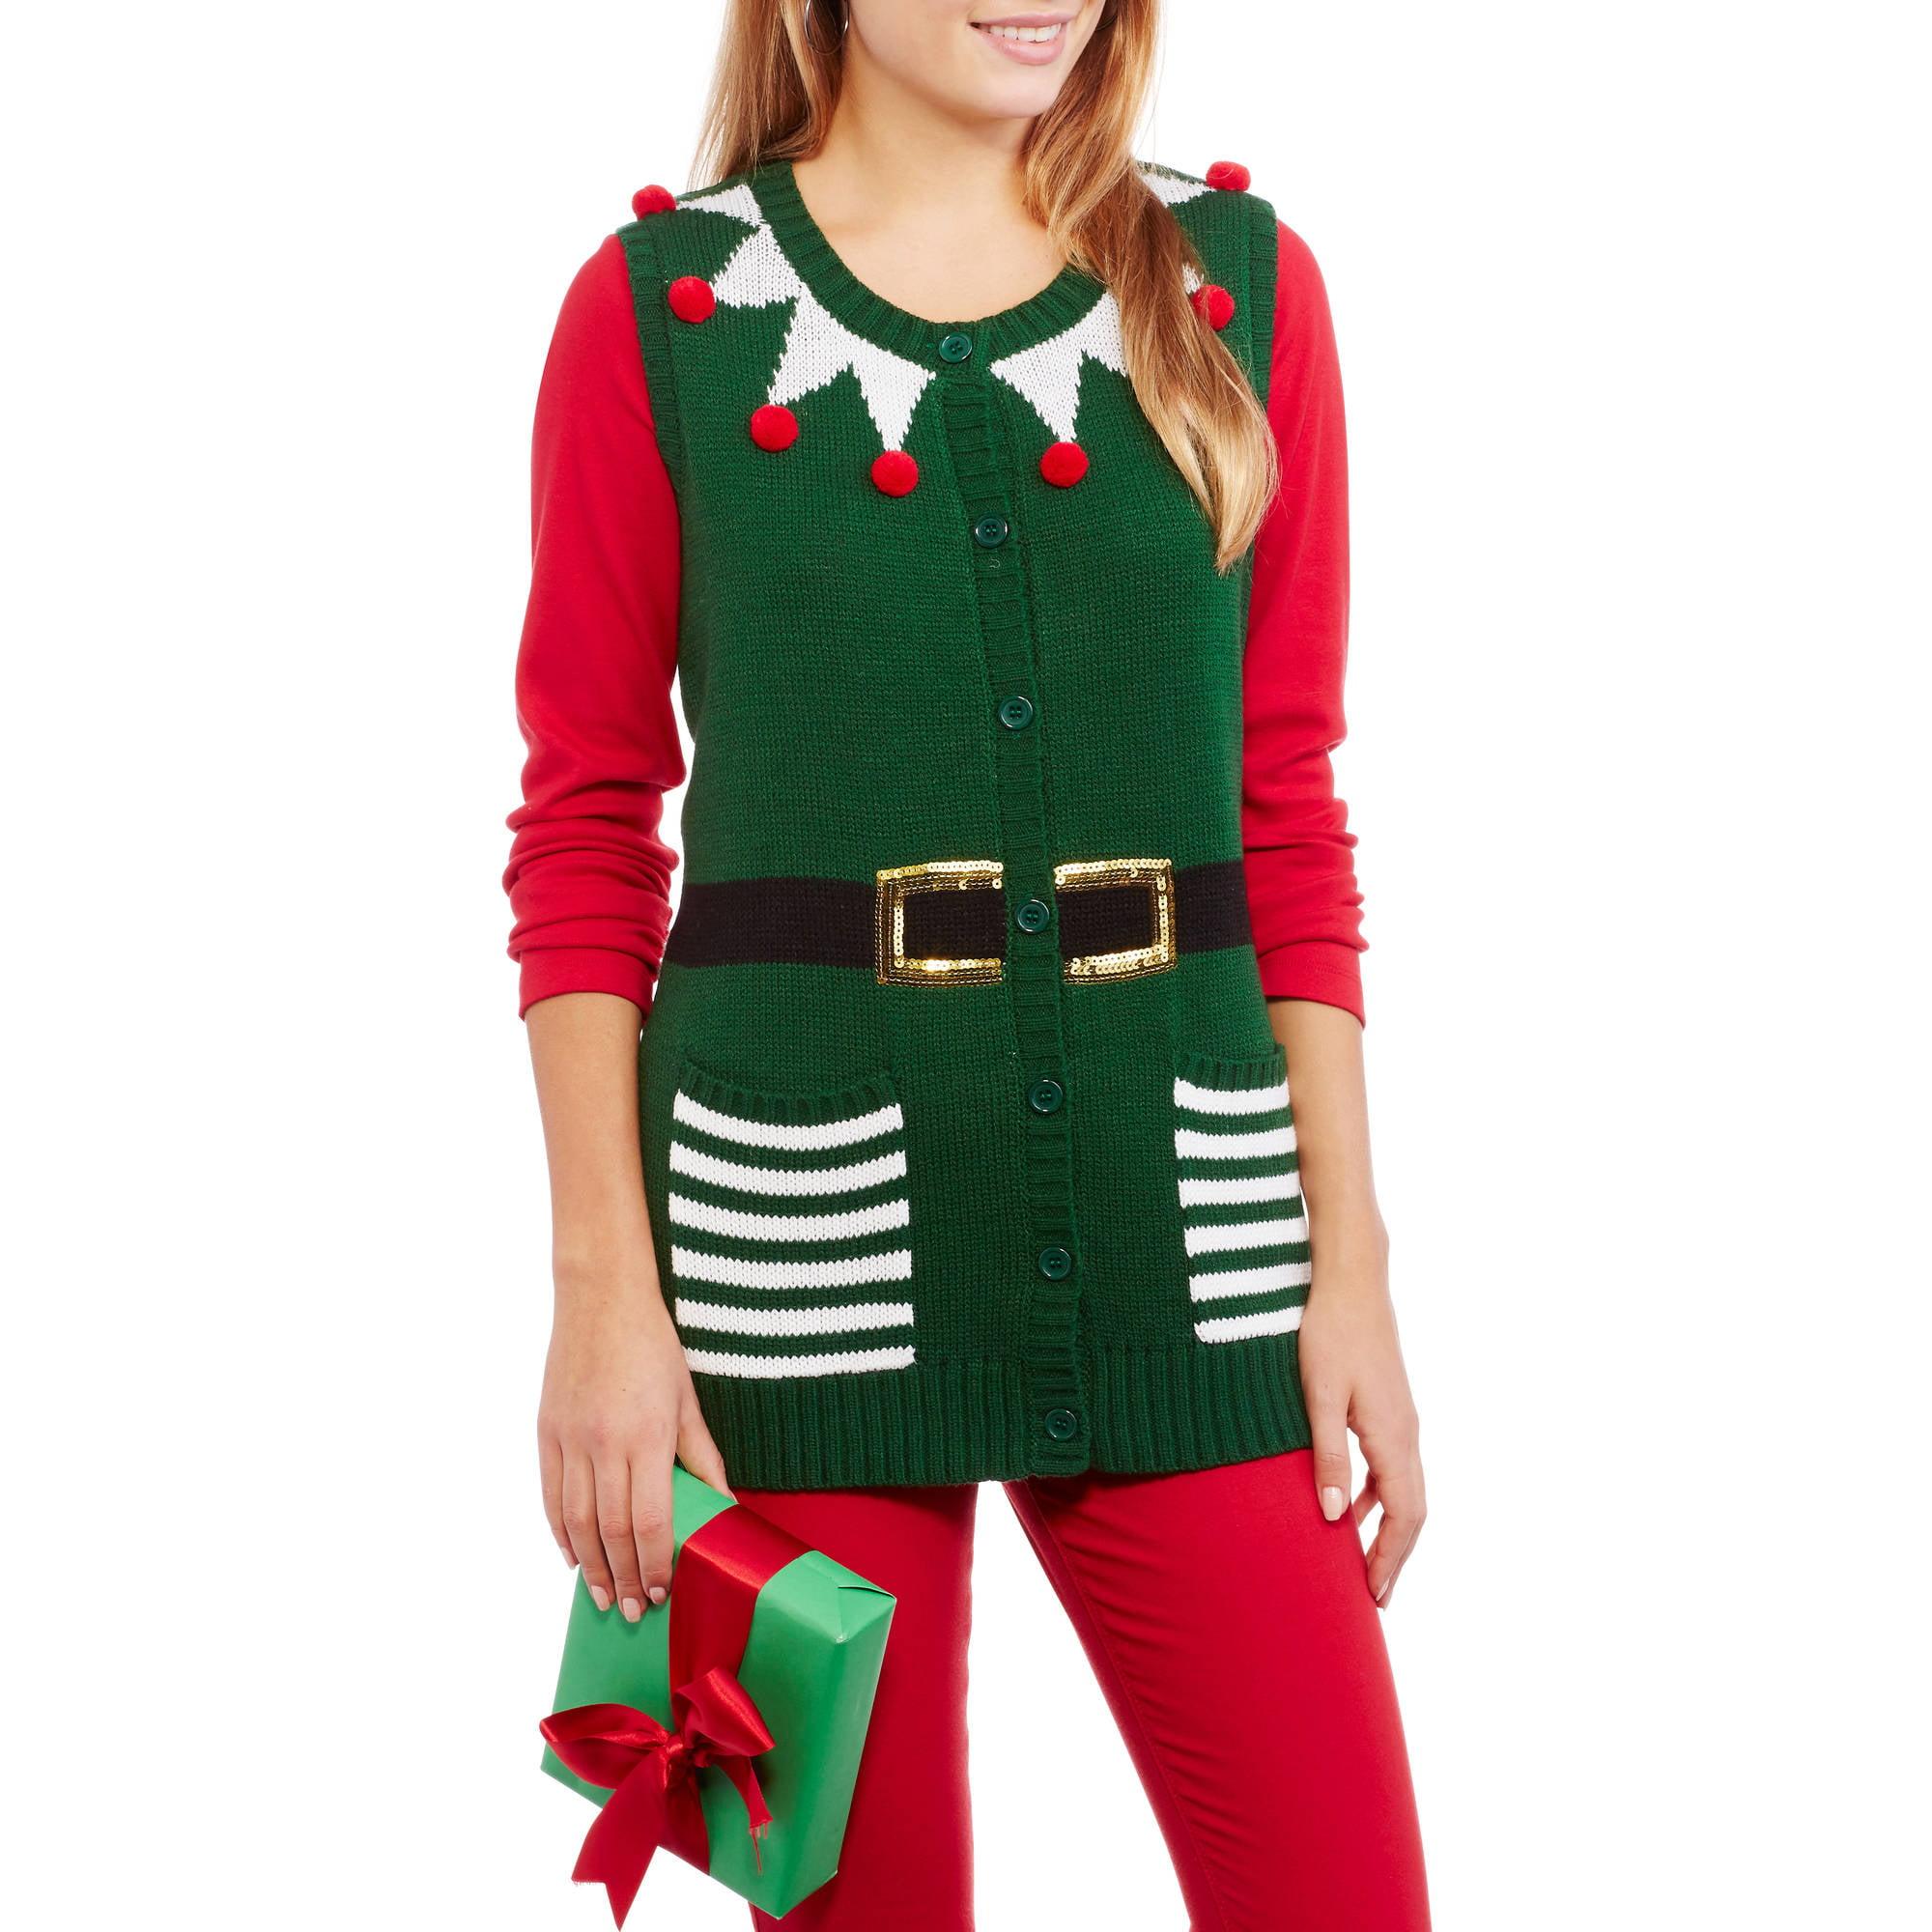 No Boundaries Juniors' Holiday Christmas Sweater Vest